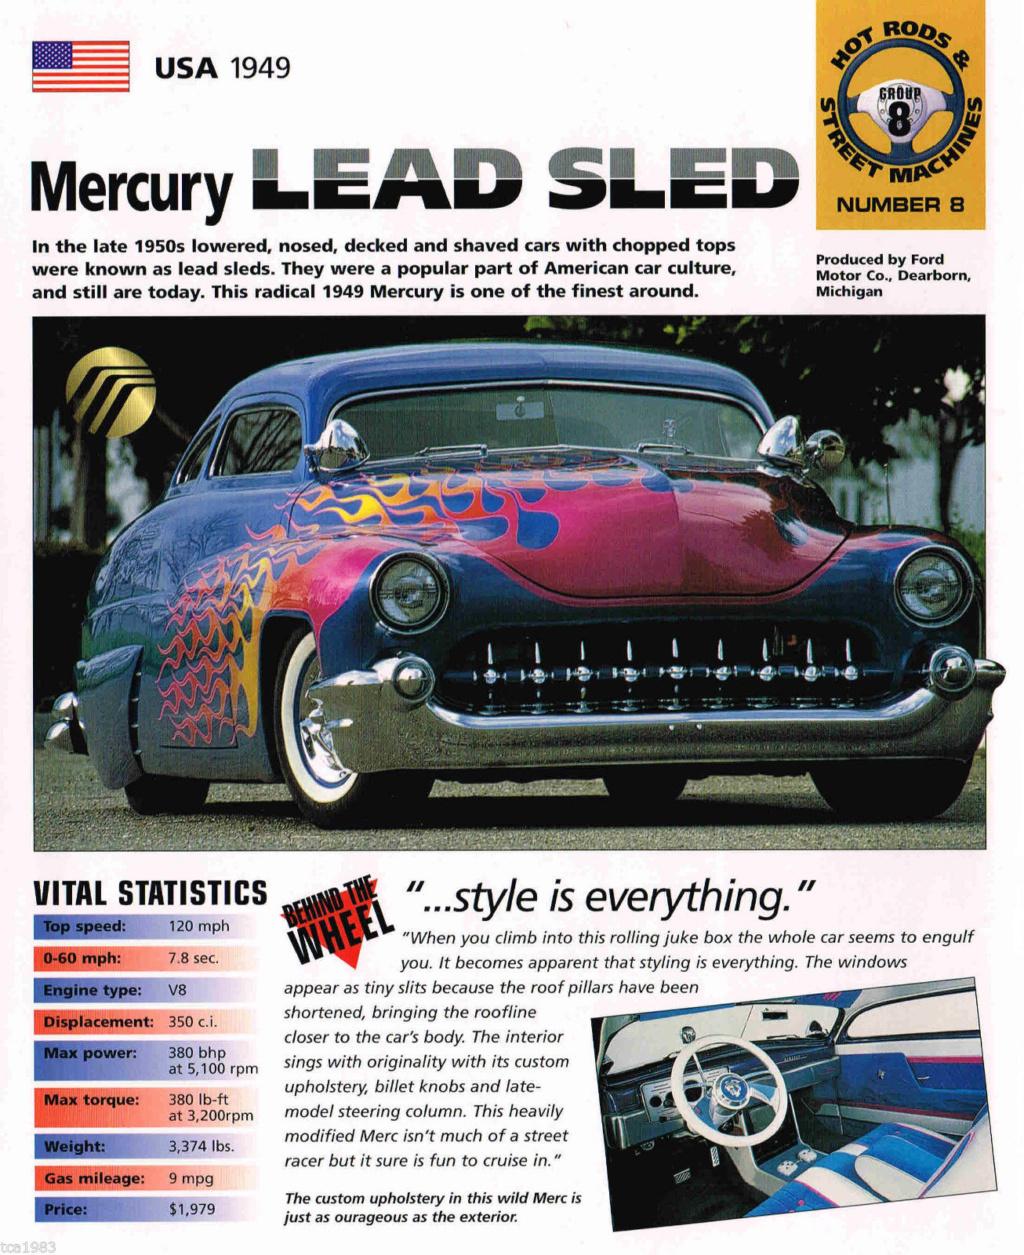 Lowrider/Lead Sled brochures - International Masters Publishers Broch410